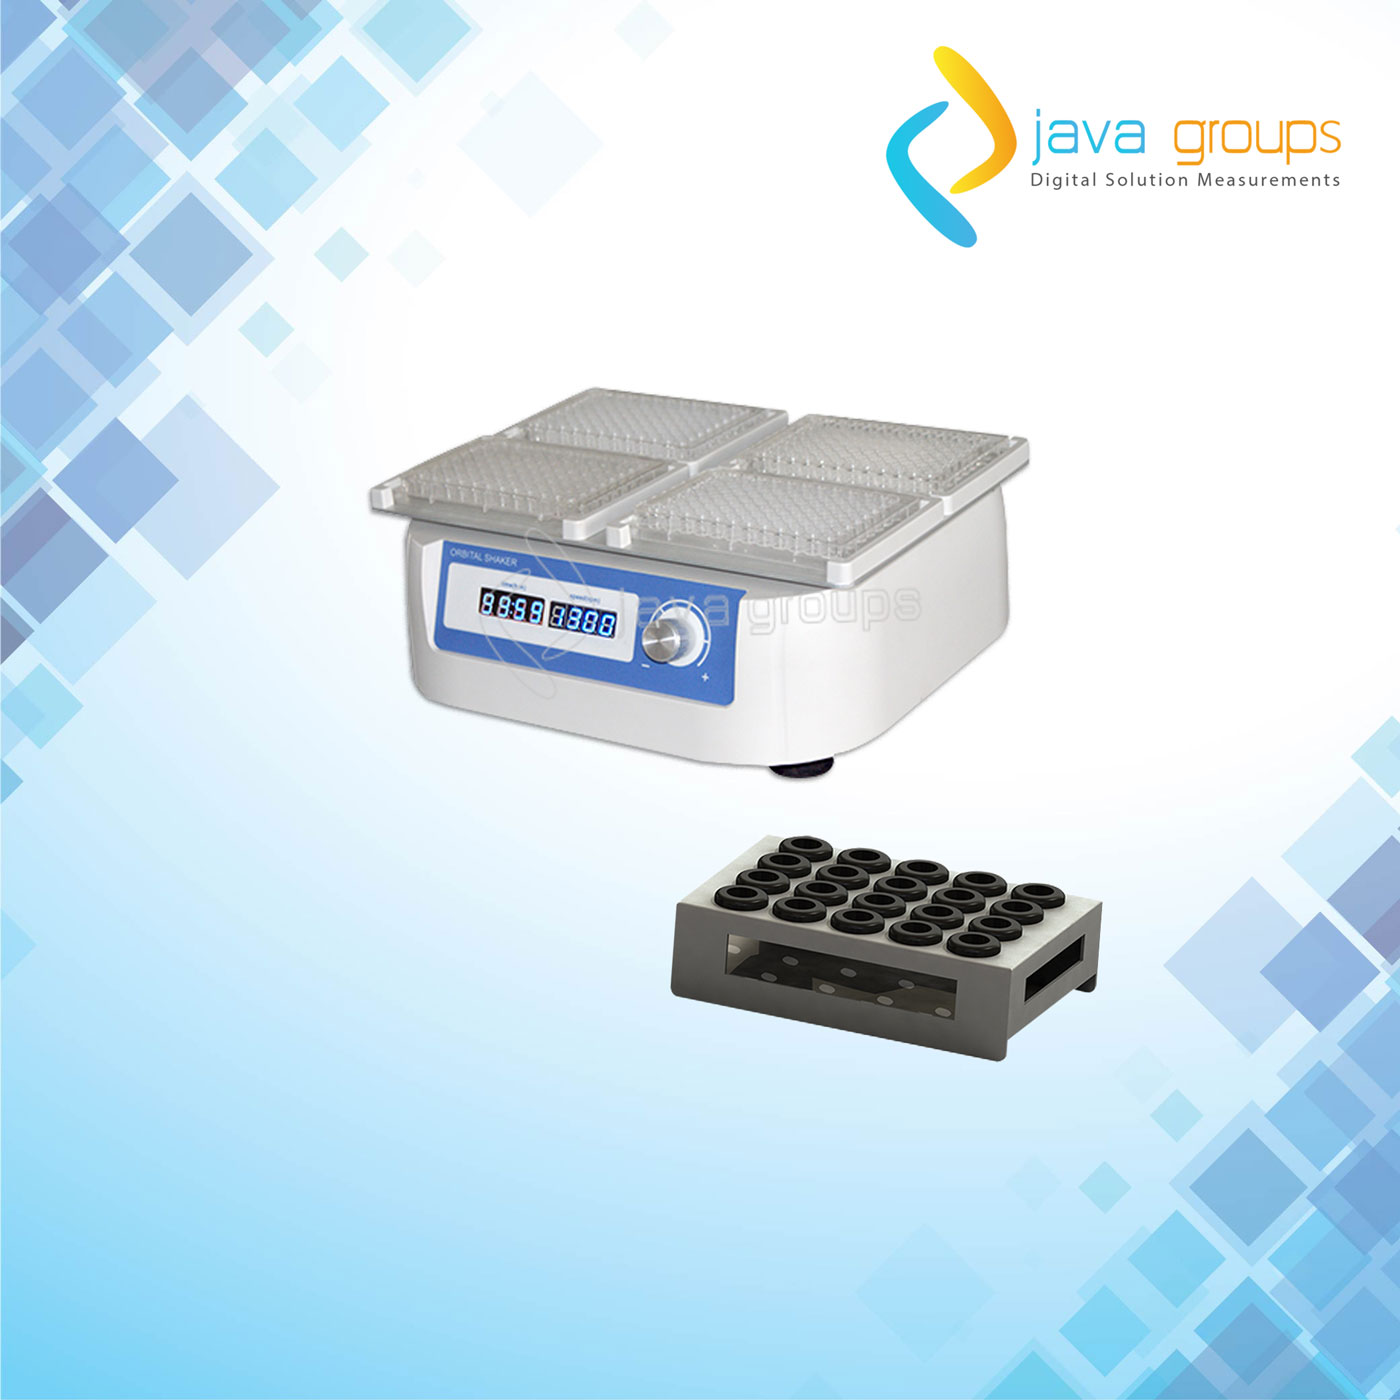 Alat Incubator Thermo Shaker Seri MX100-4A